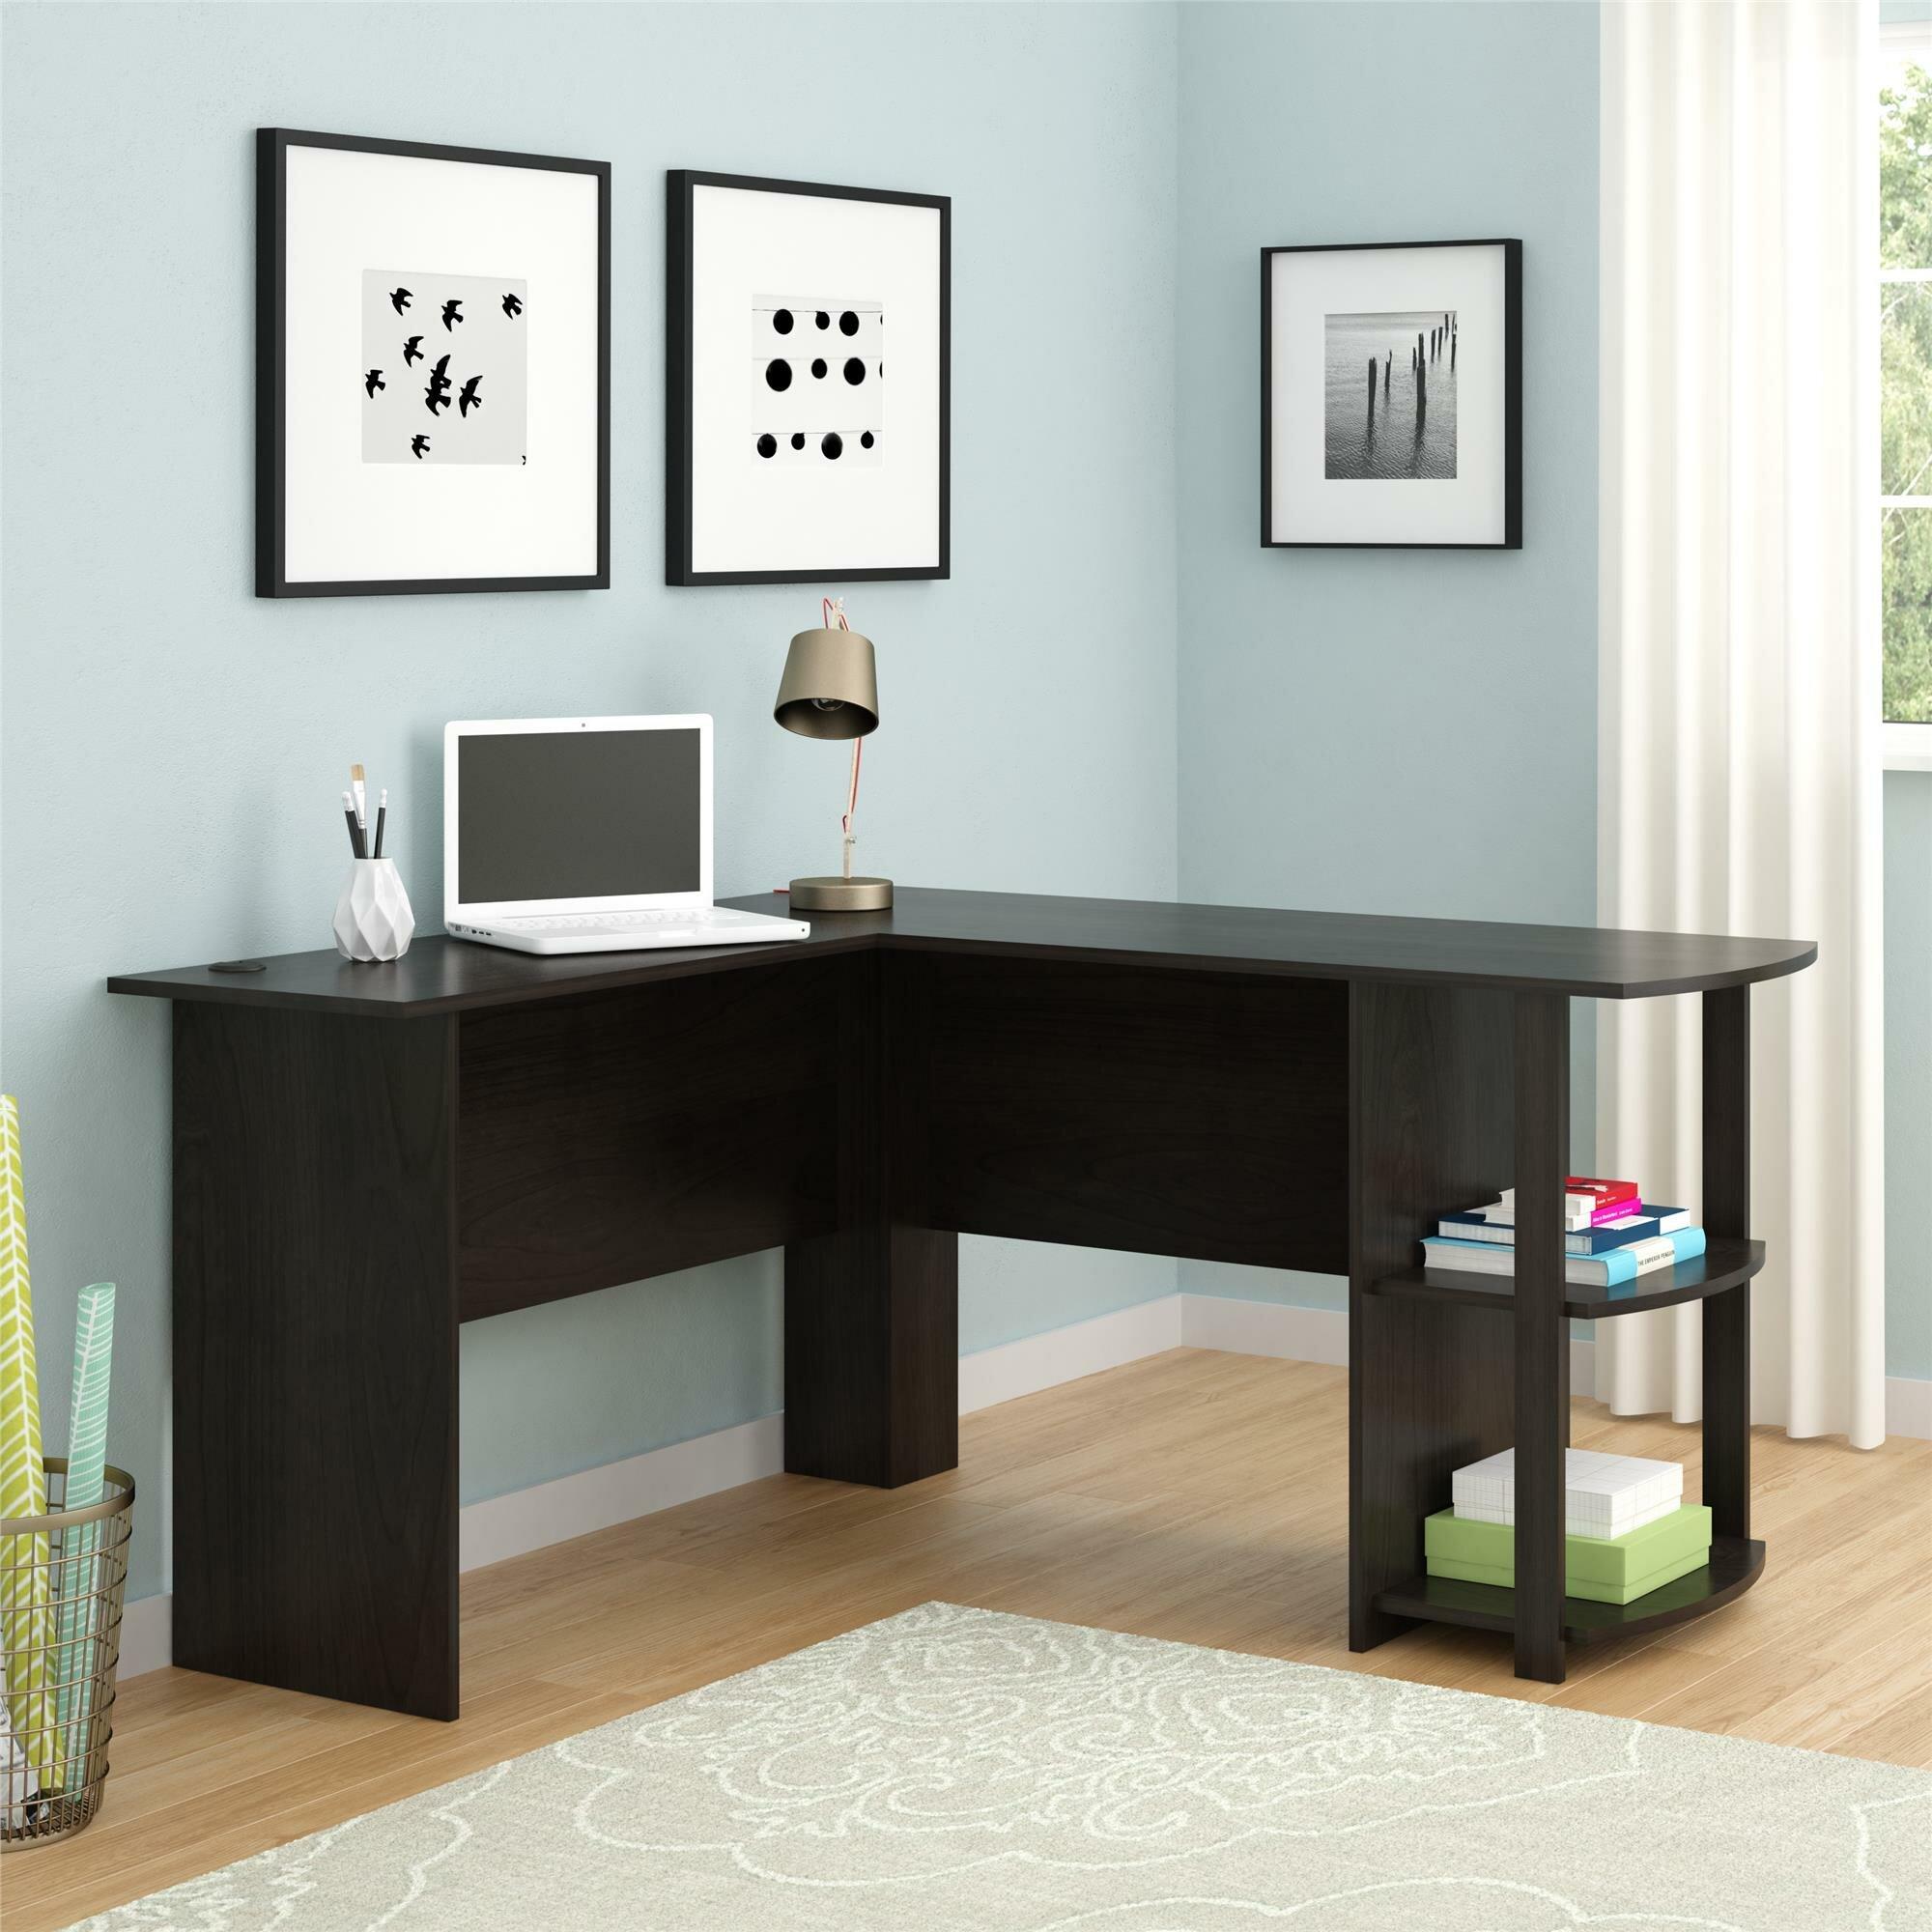 andover mills salina l shape corner desk reviews wayfair rh wayfair com Corner L Desk with Hutch L-shaped Corner Desk